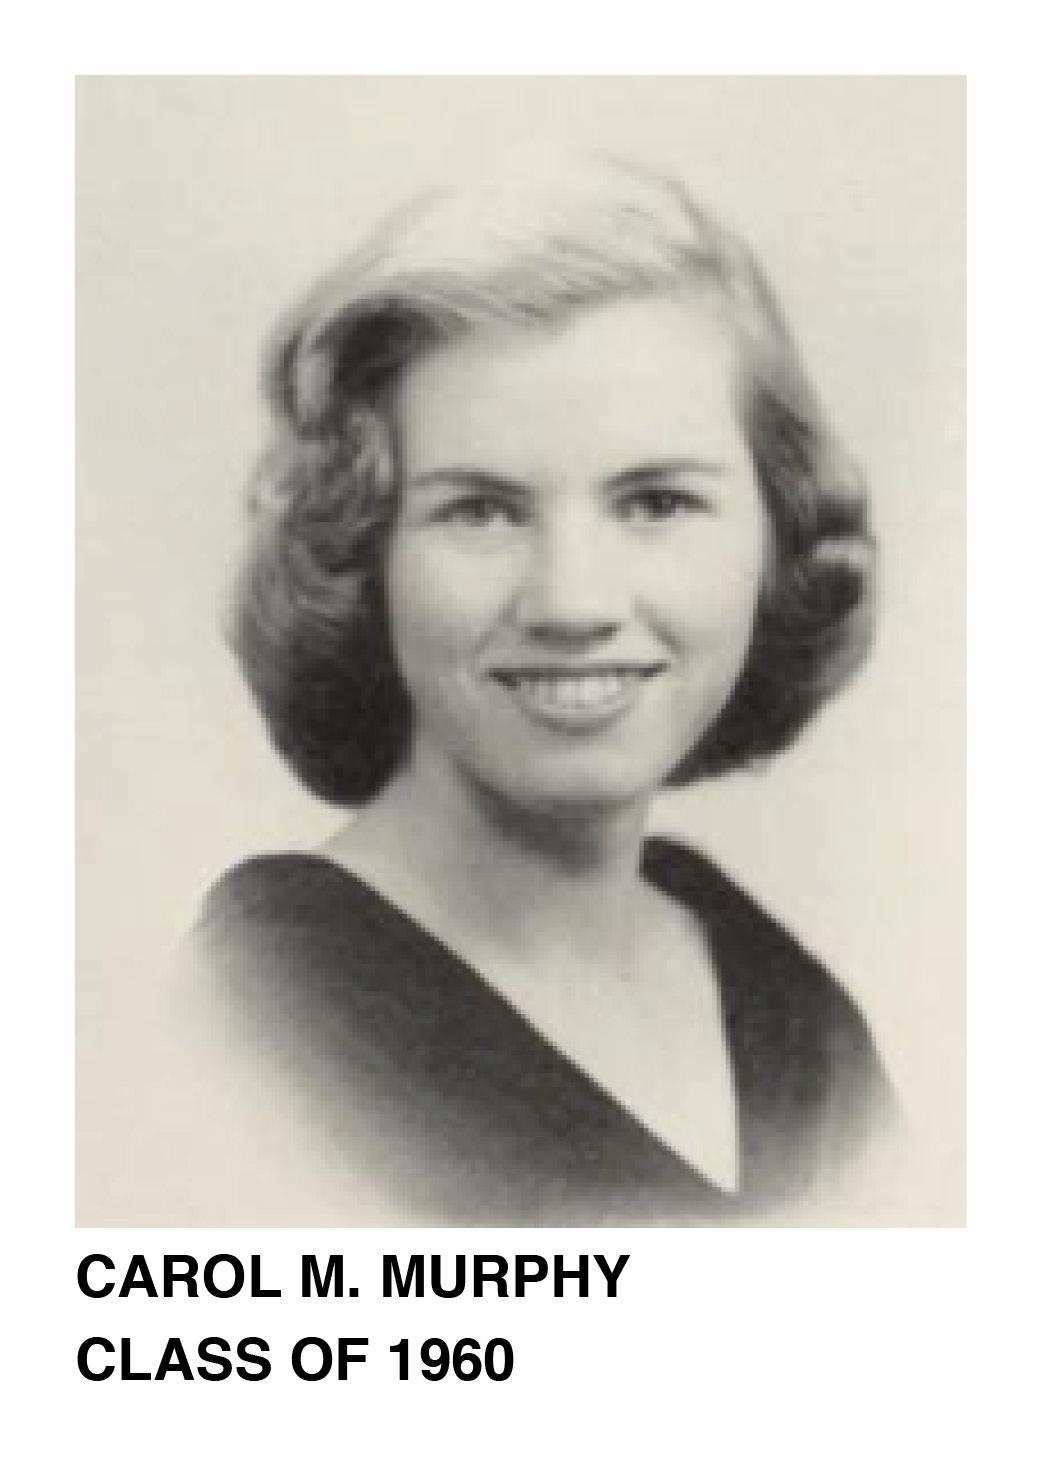 Carol M. Murphy Class of 1960